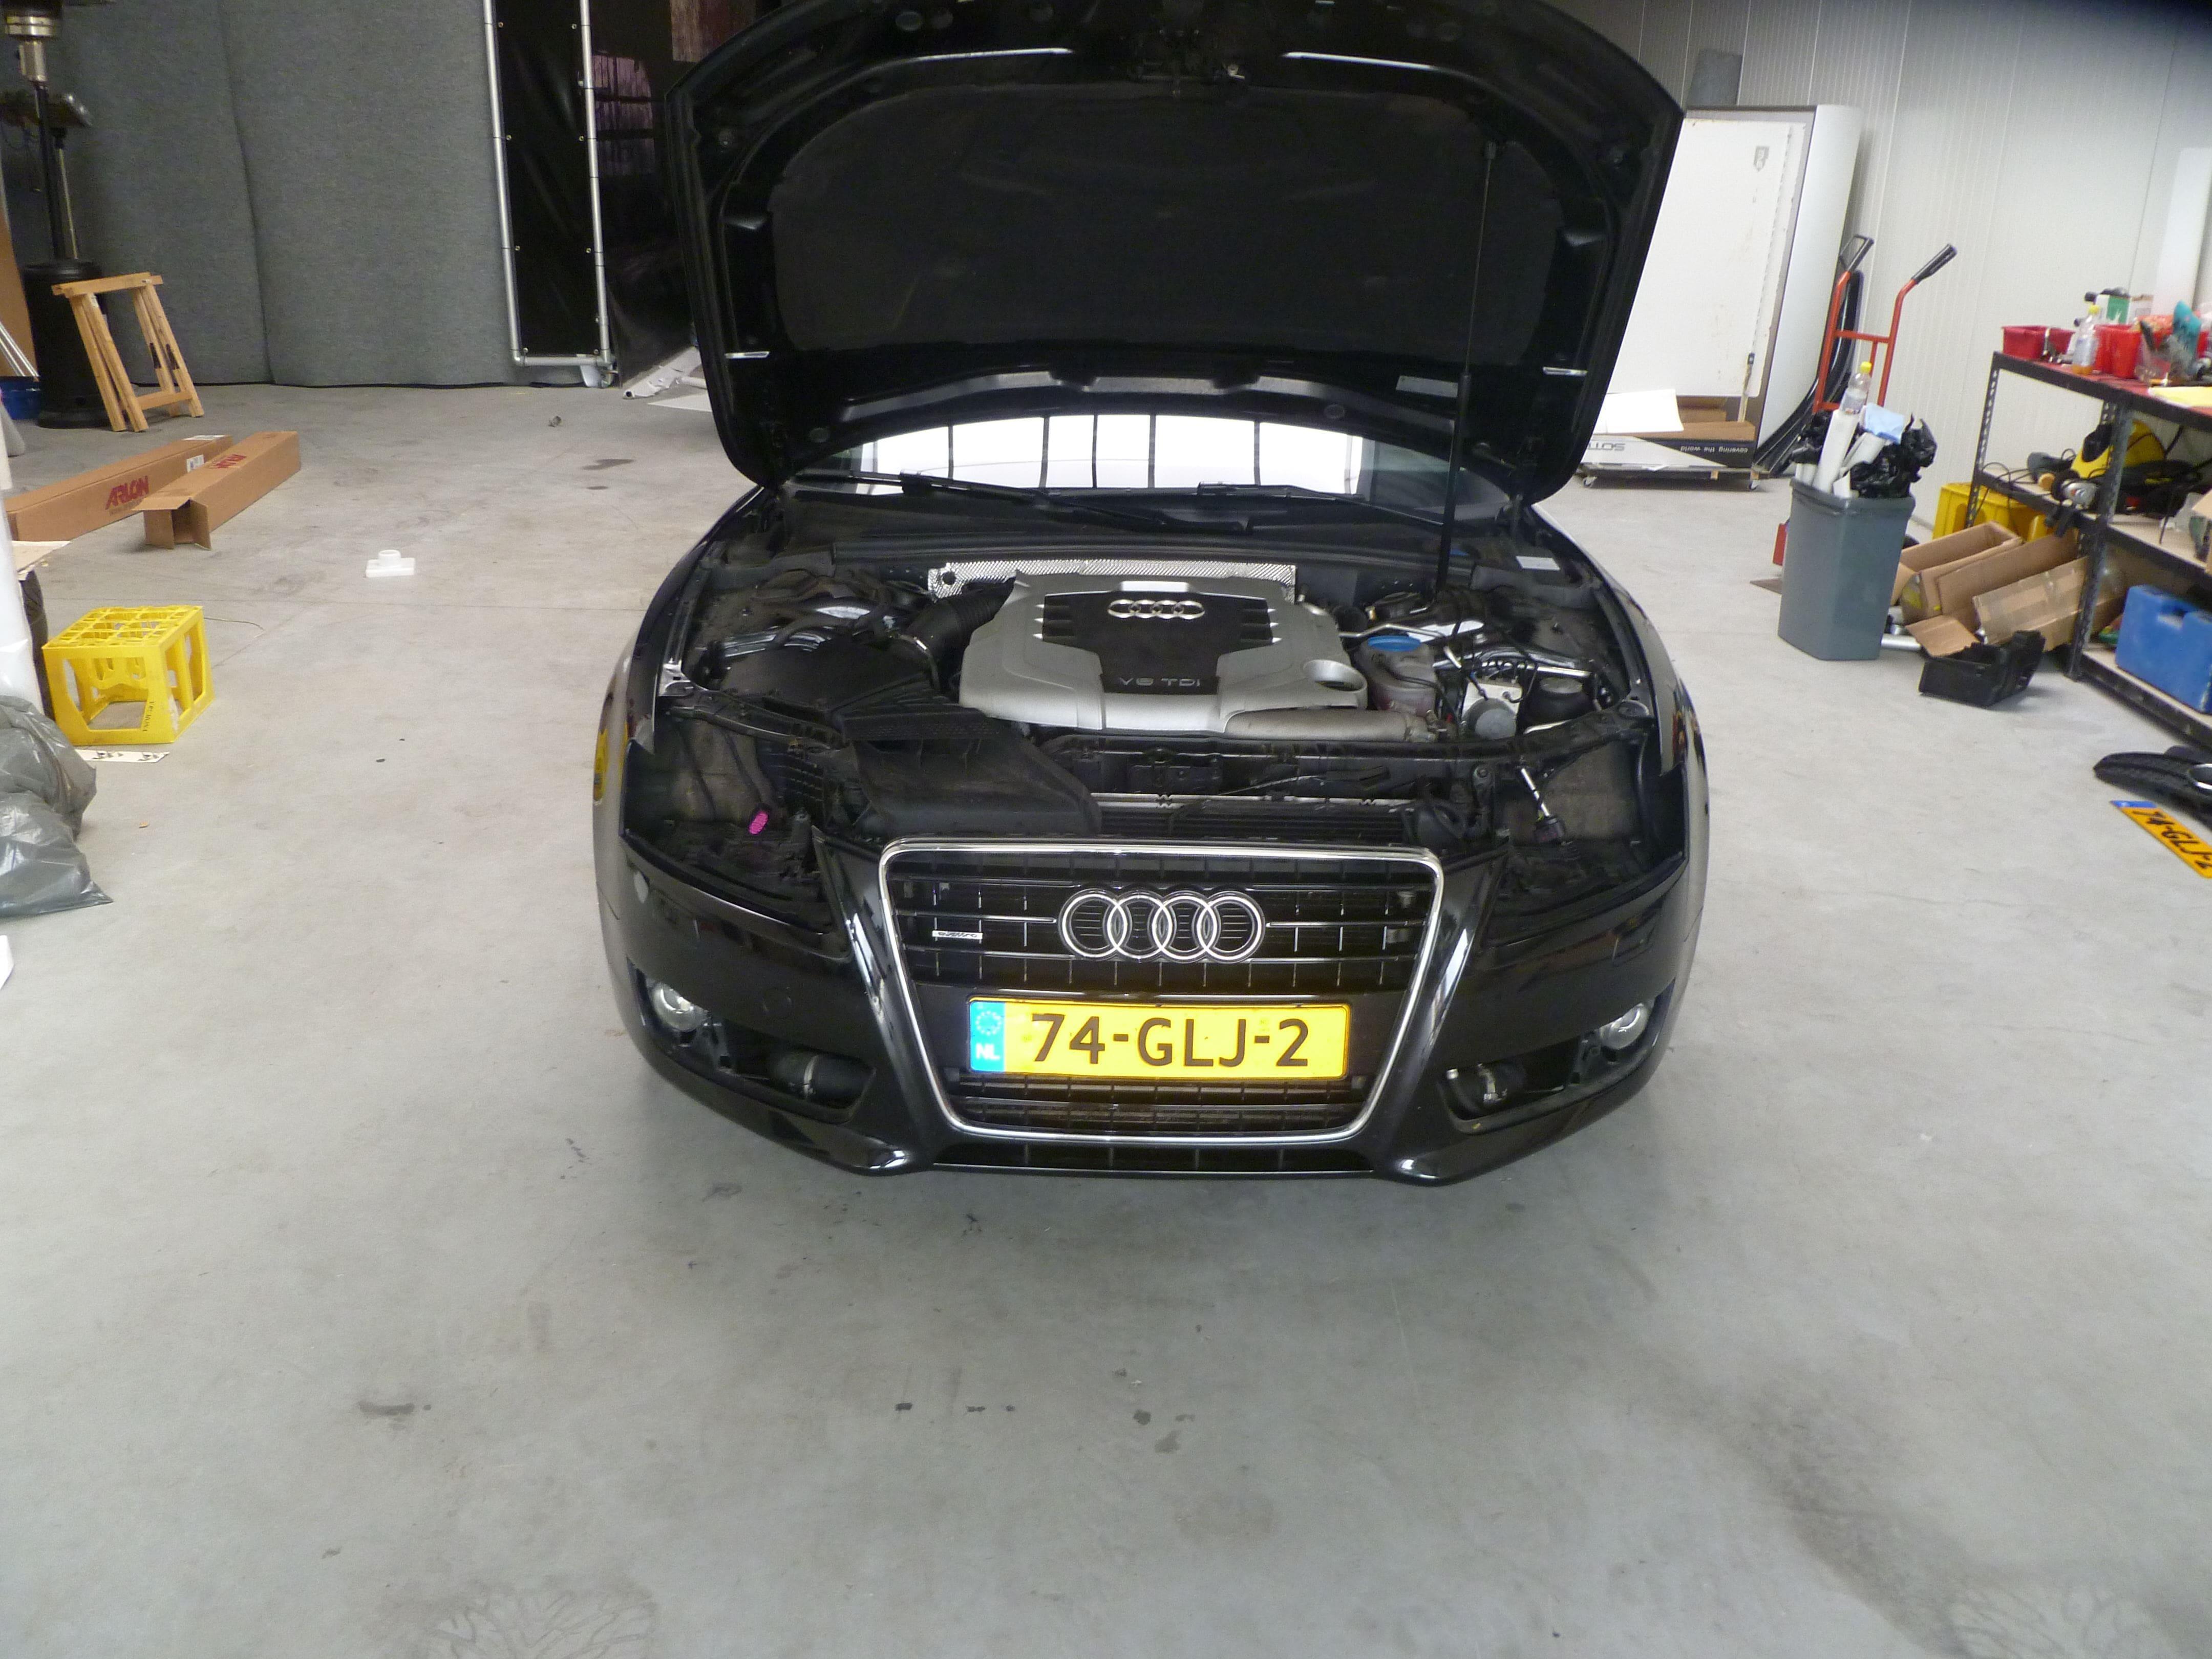 Audi A5 coupe met Metallic Witte Wrap, Carwrapping door Wrapmyride.nu Foto-nr:4678, ©2021